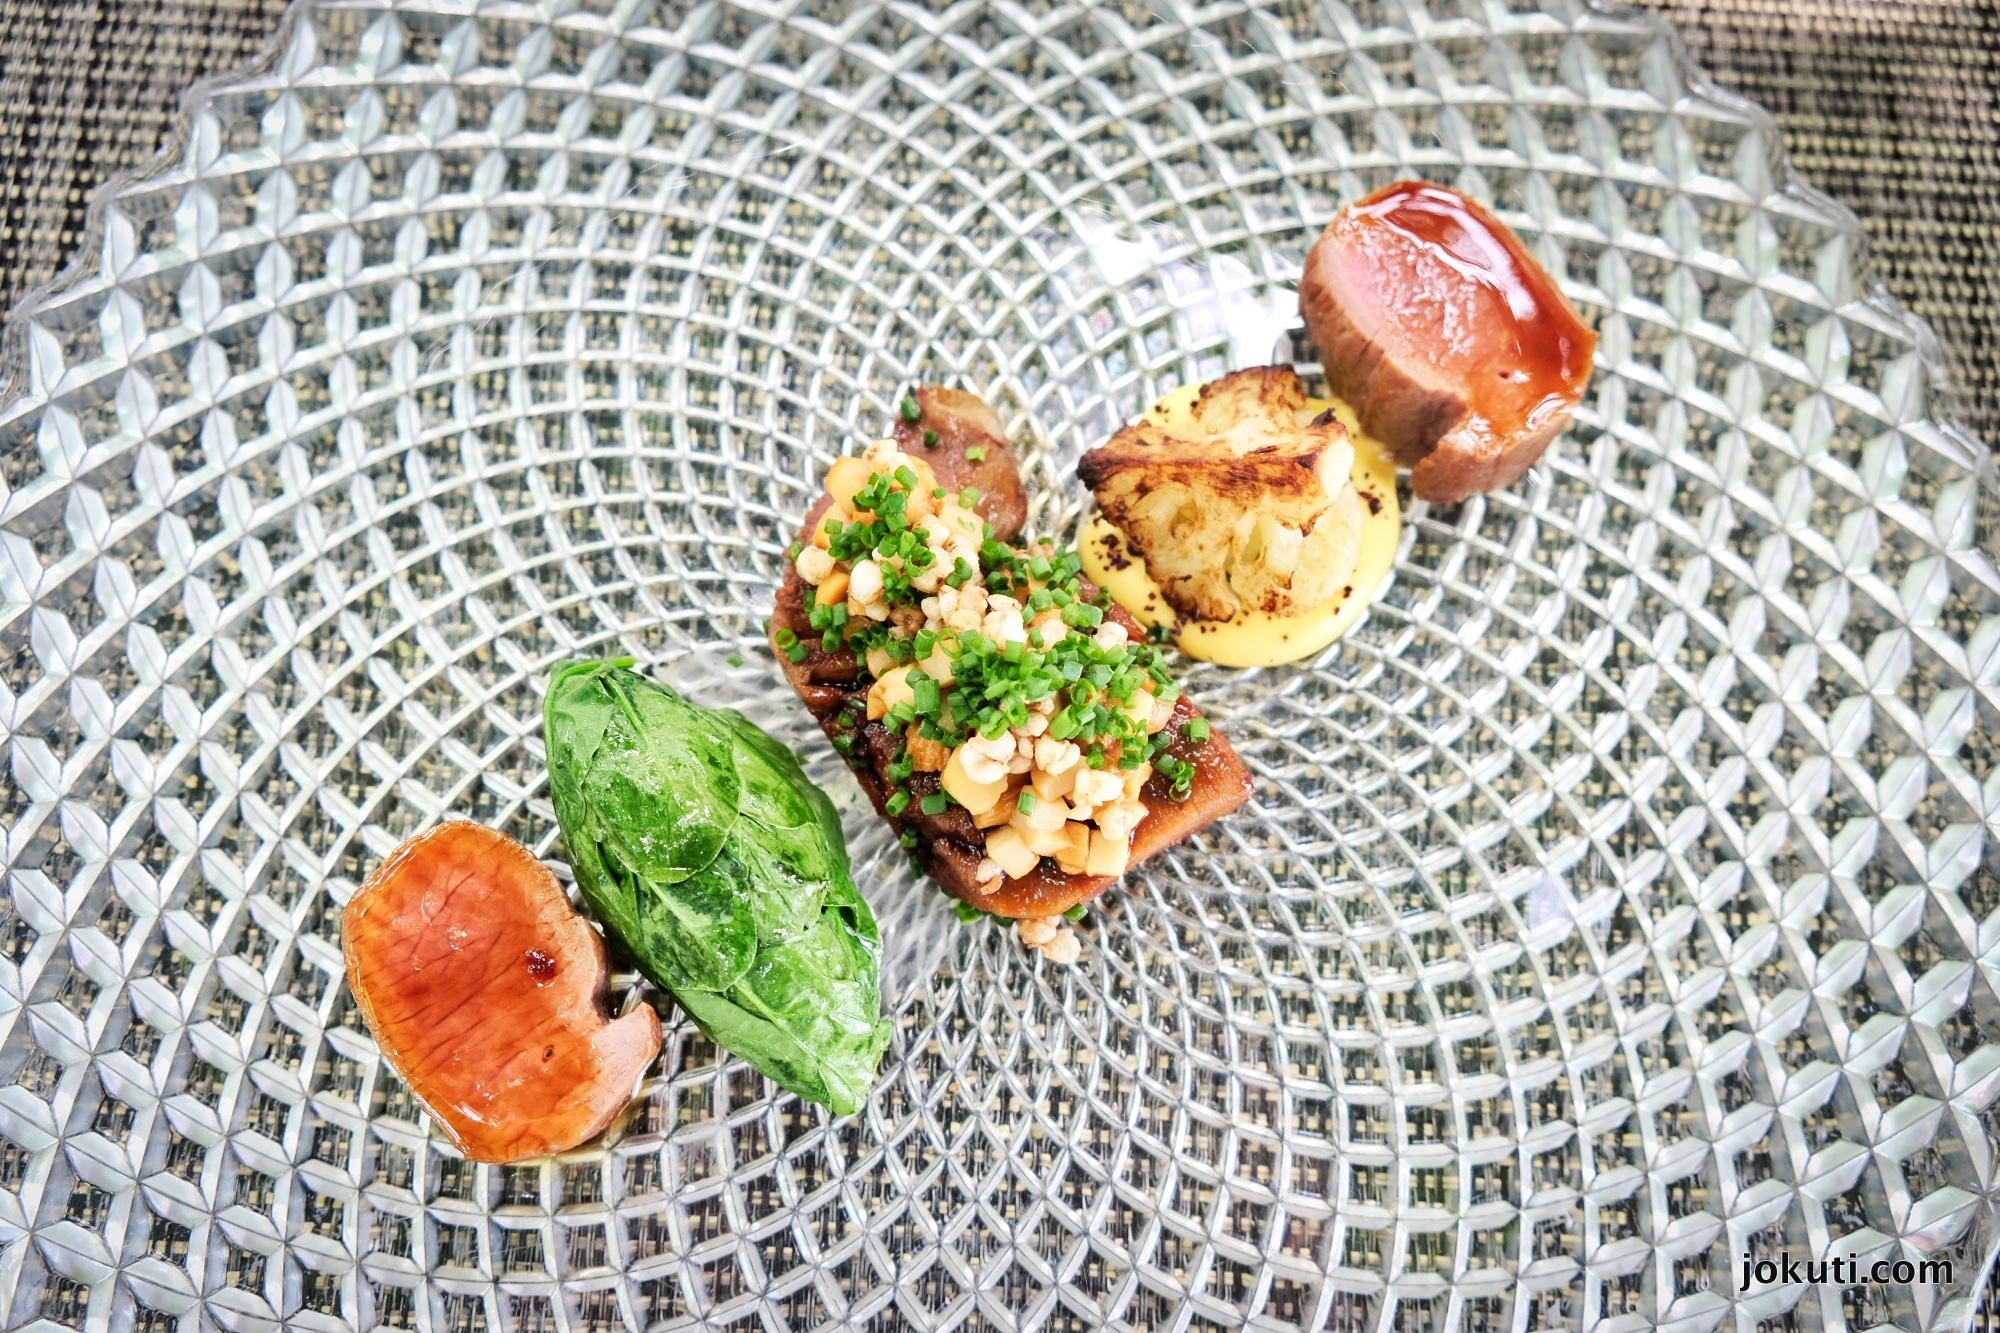 dscf6950_platan_tata_pesti_restaurant_denmark_vilagevo_jokuti_andras_l_l.jpg